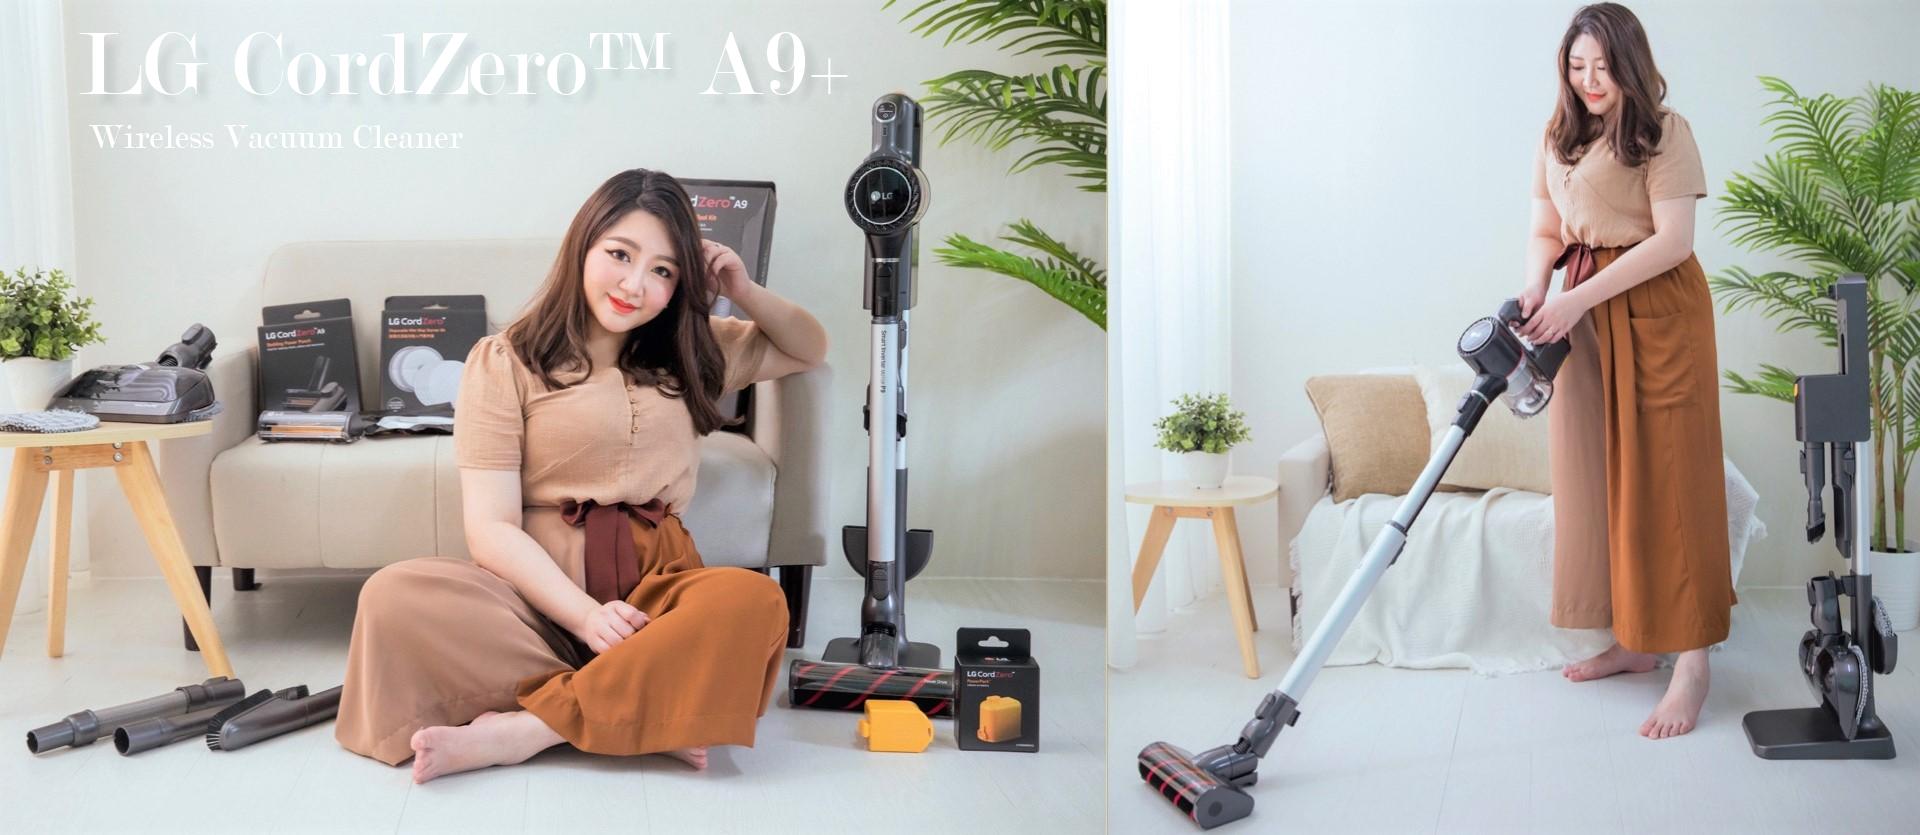 LG CordZero™ A9+濕拖無線吸塵器